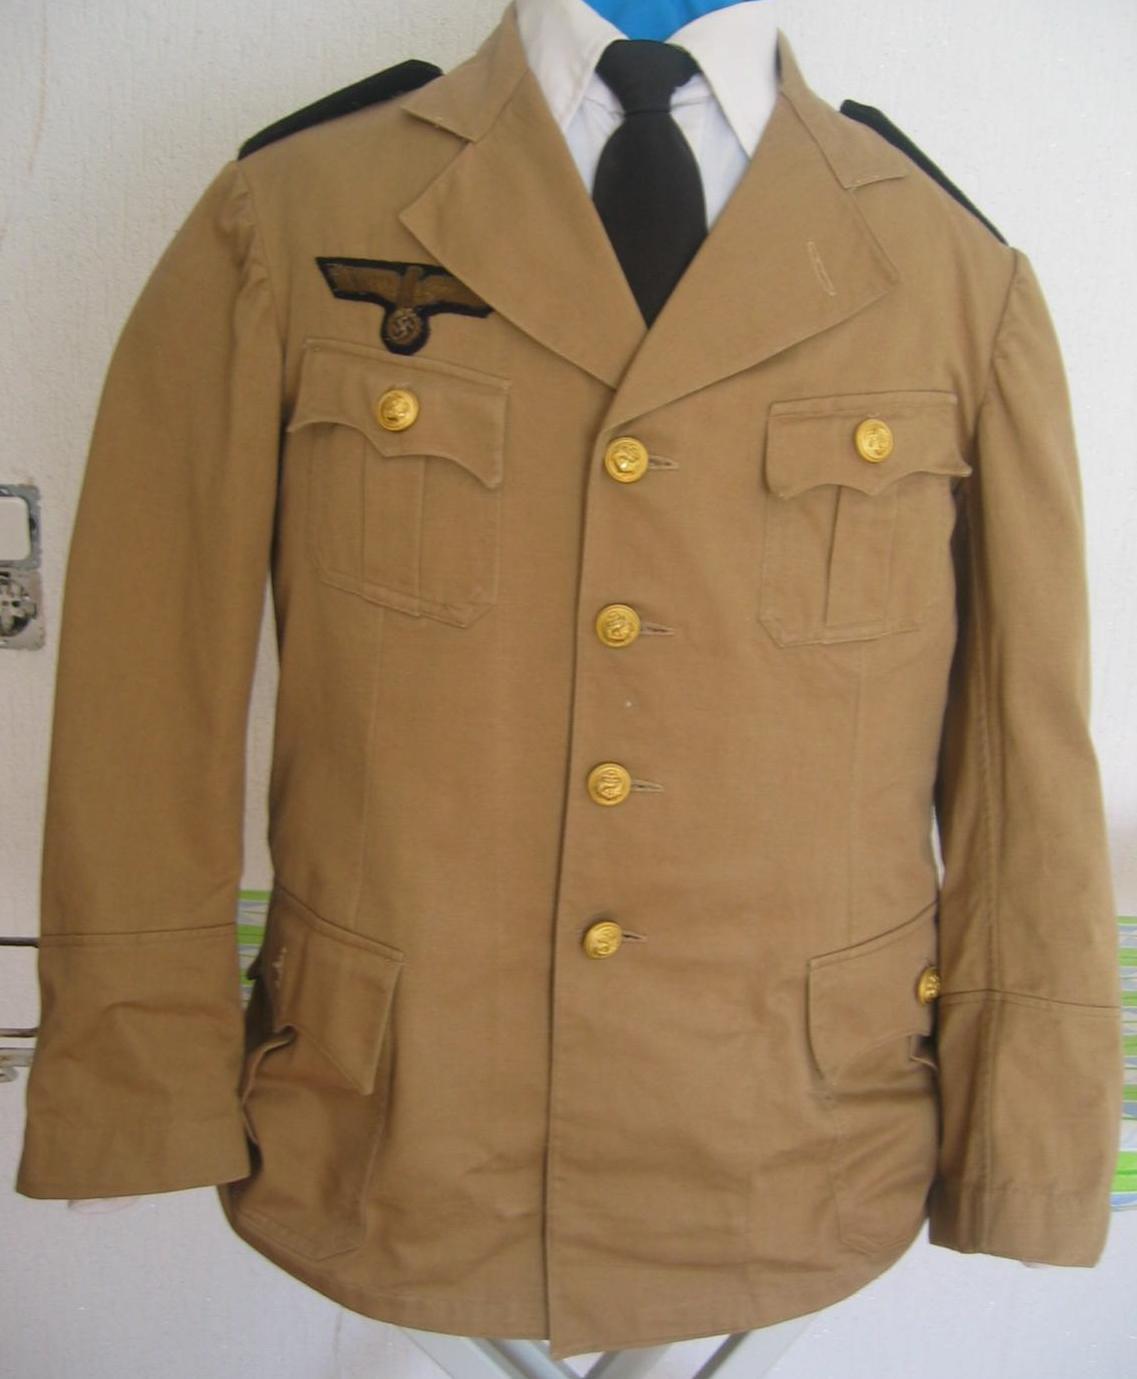 Feldbluse Aftrikakorps Wehrmacht Heer 2. Weltkrieg